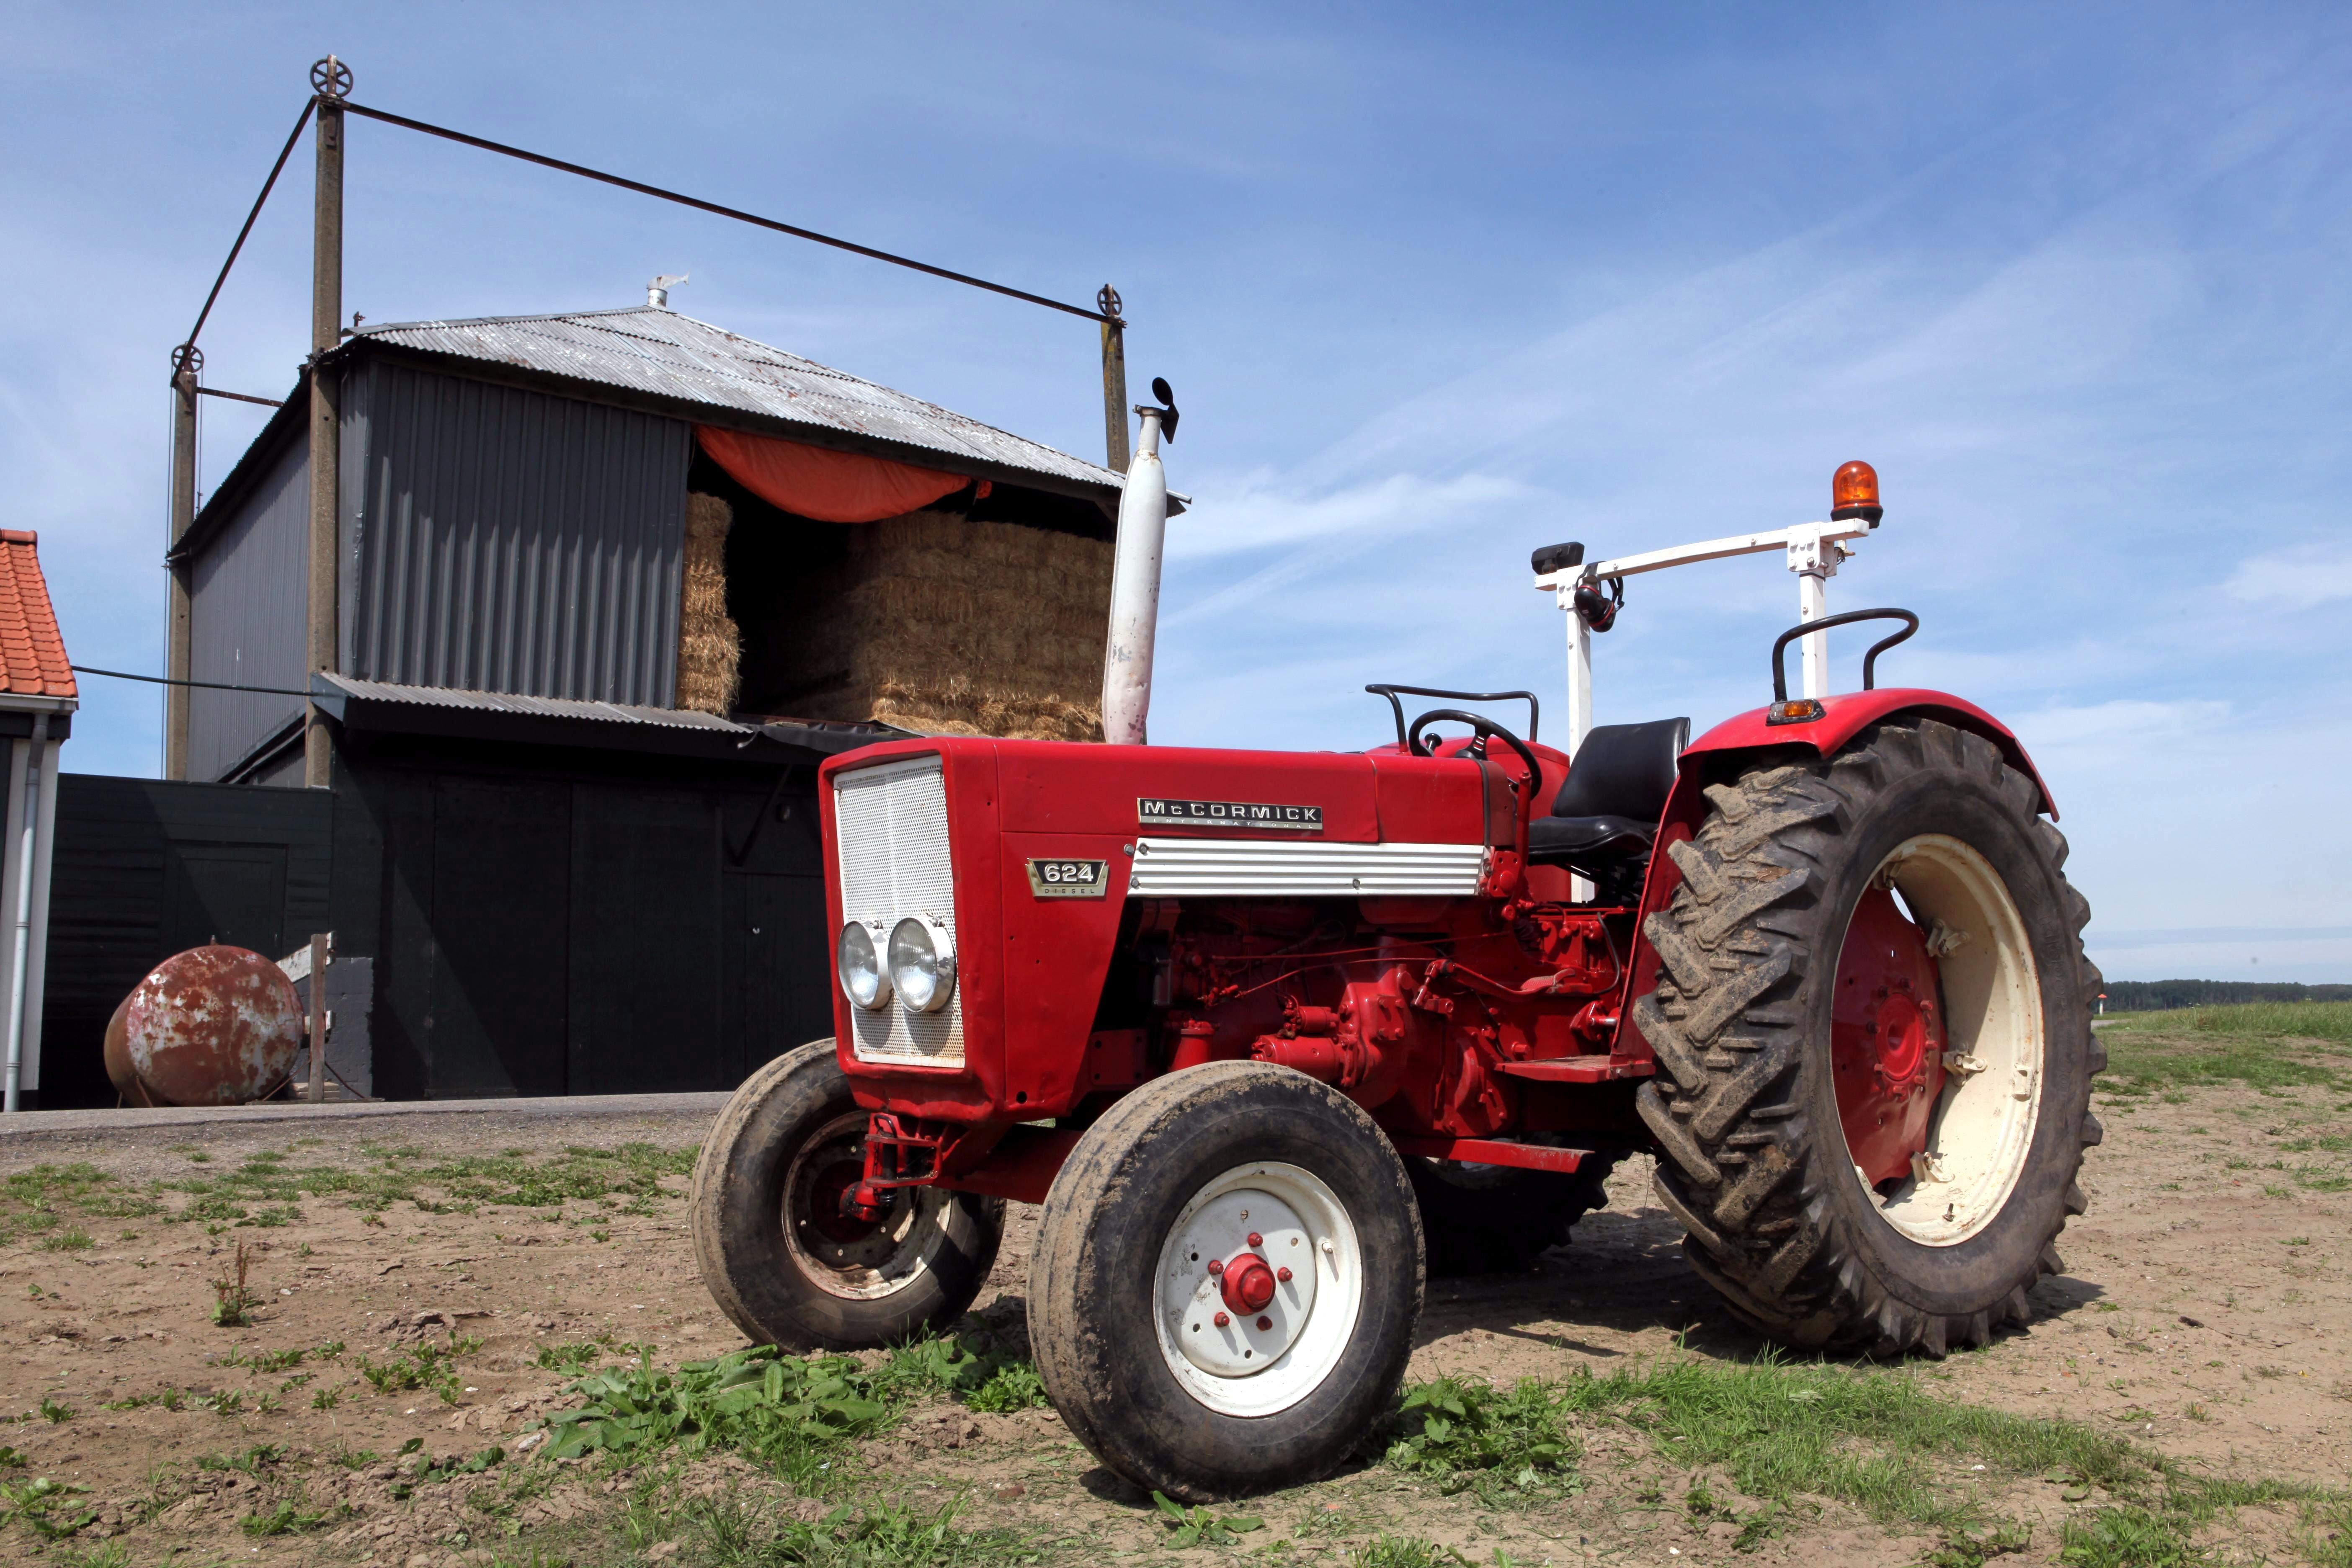 File:McCormick 624 tractor.jpg